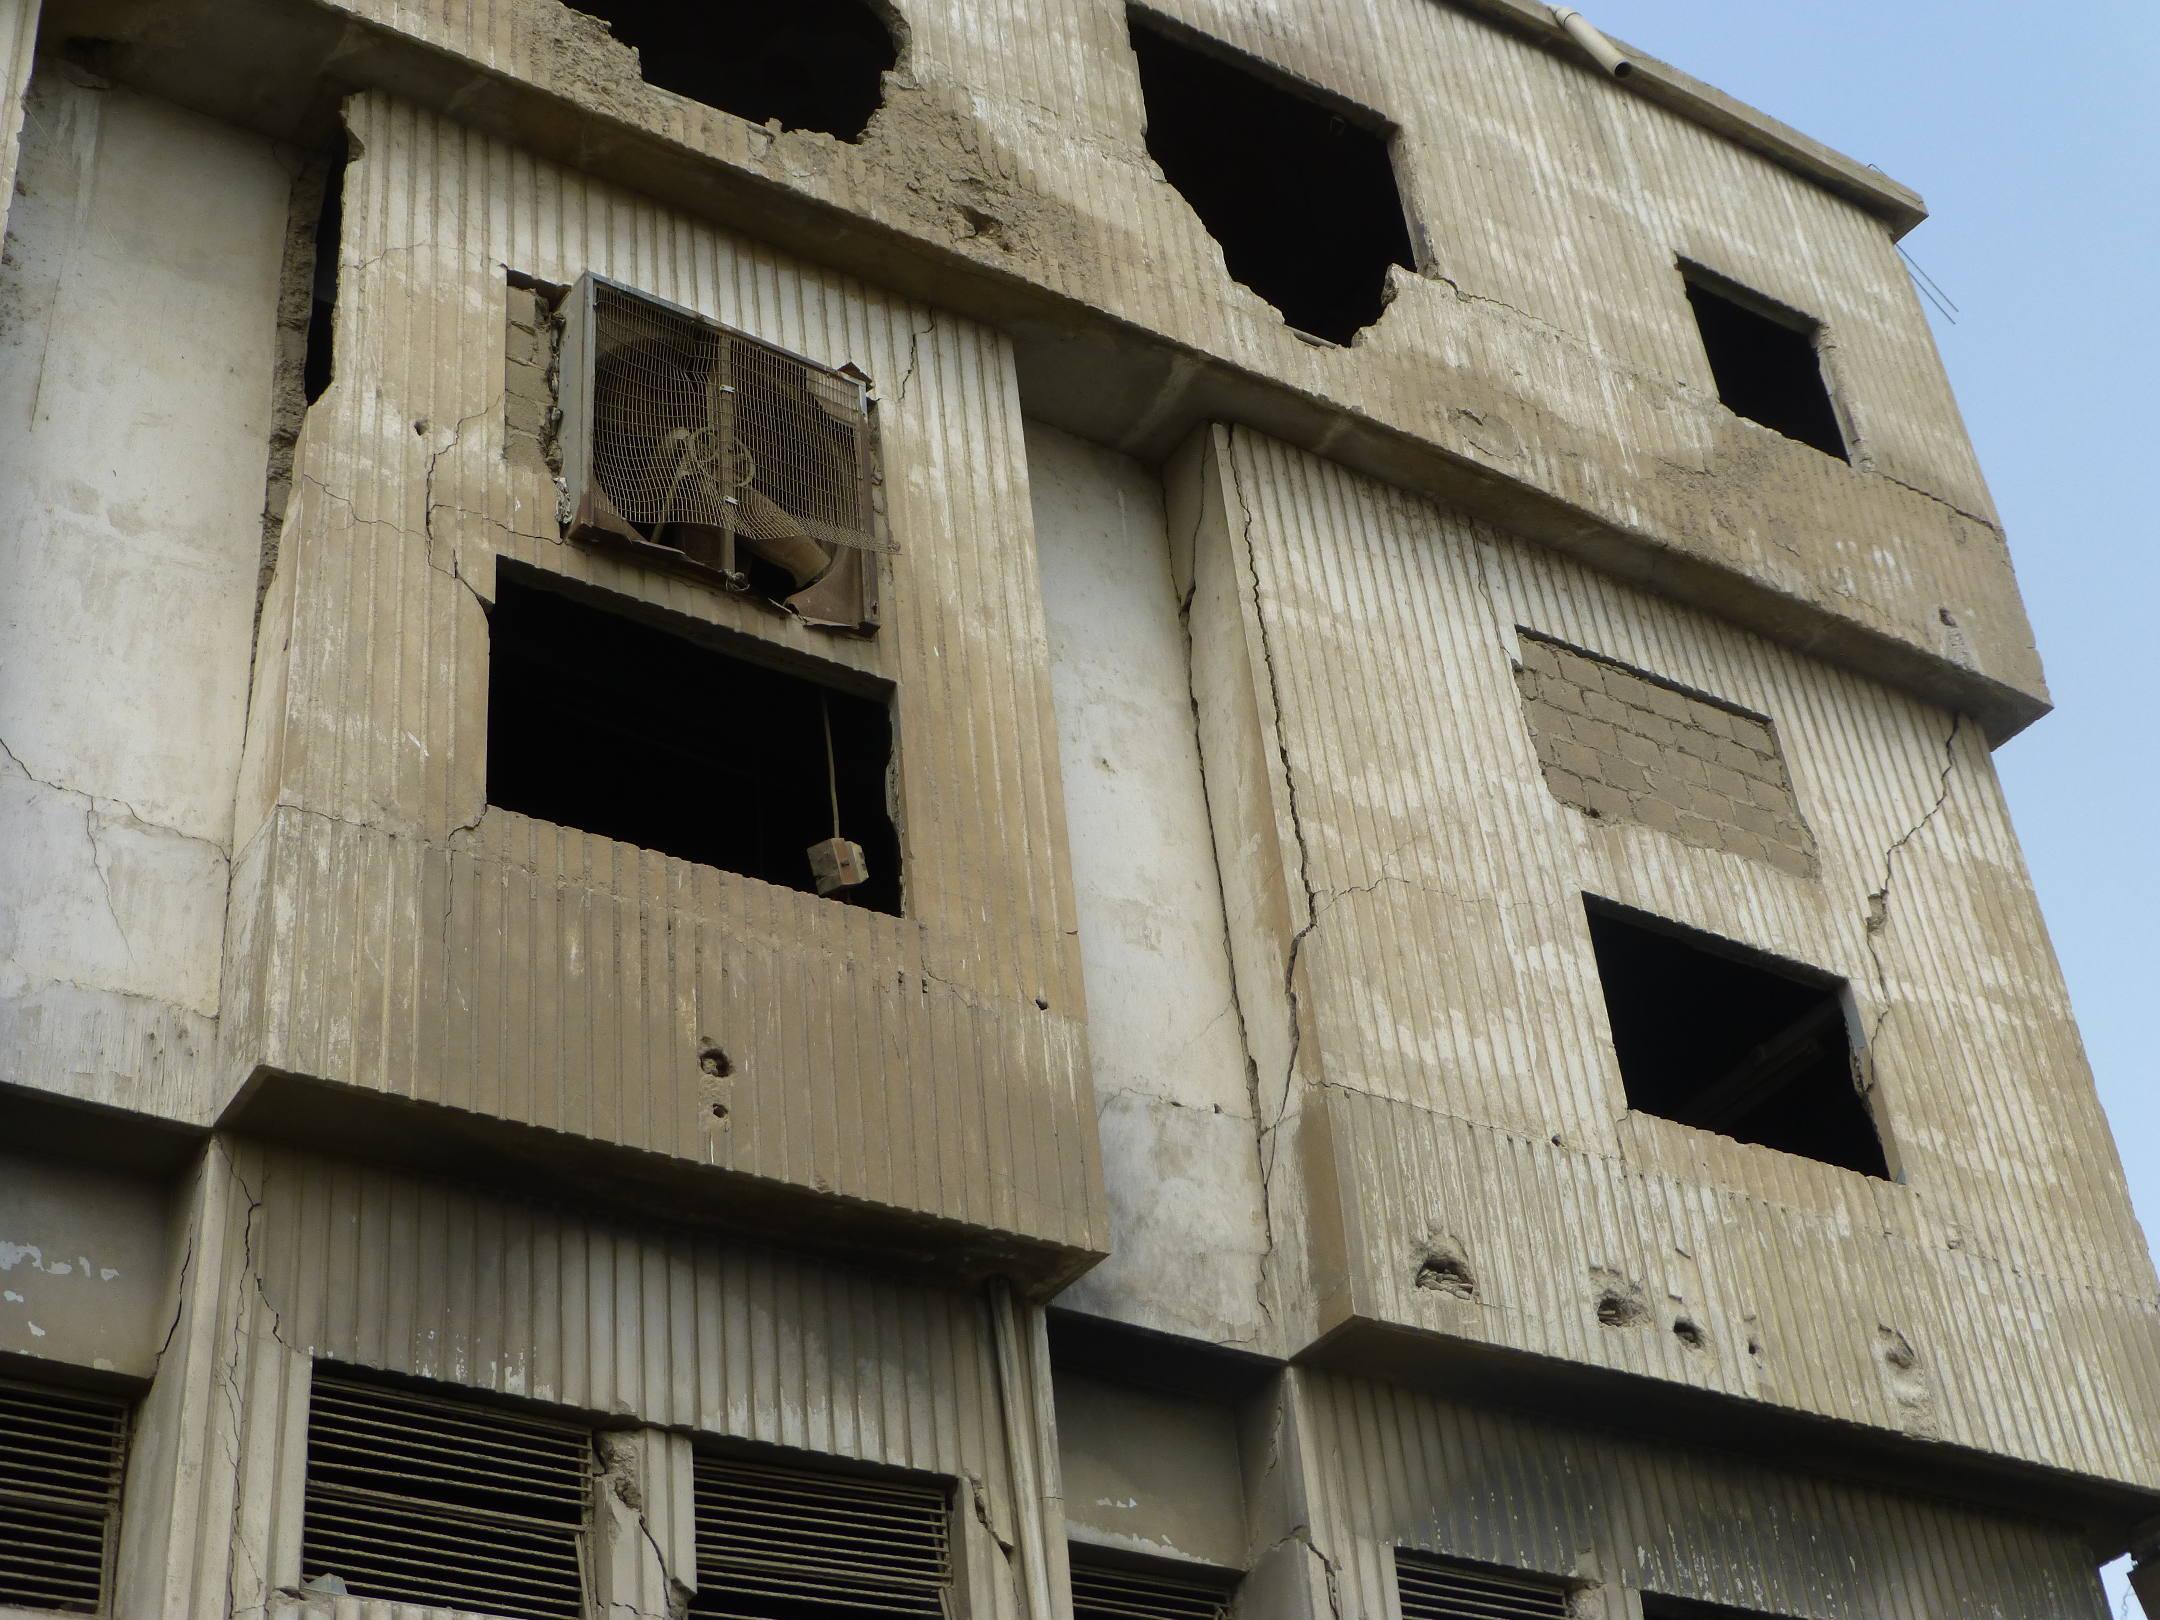 Queja formal contra la auditora RINA por el incendio de la fábrica textil Ali Enterprises